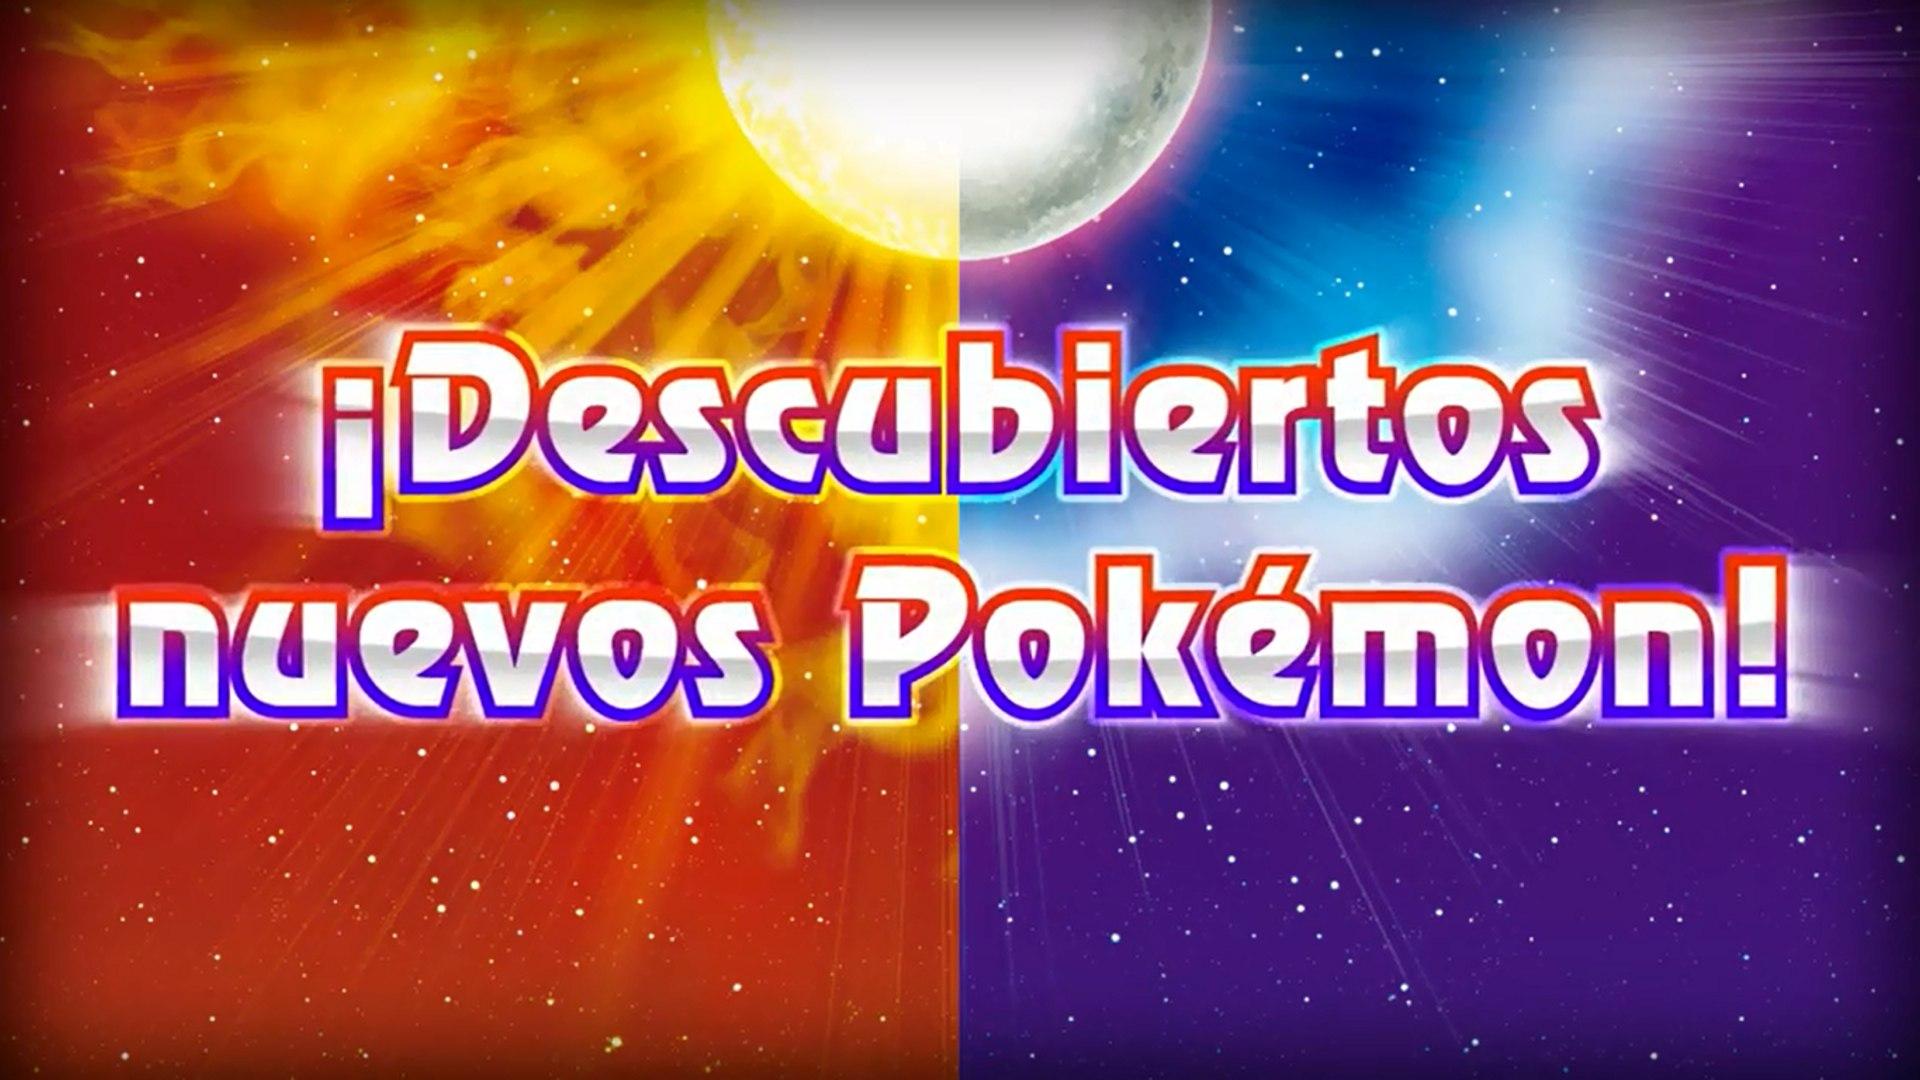 Pokémon Sol y Pokémon Luna - Tráiler E3 2016